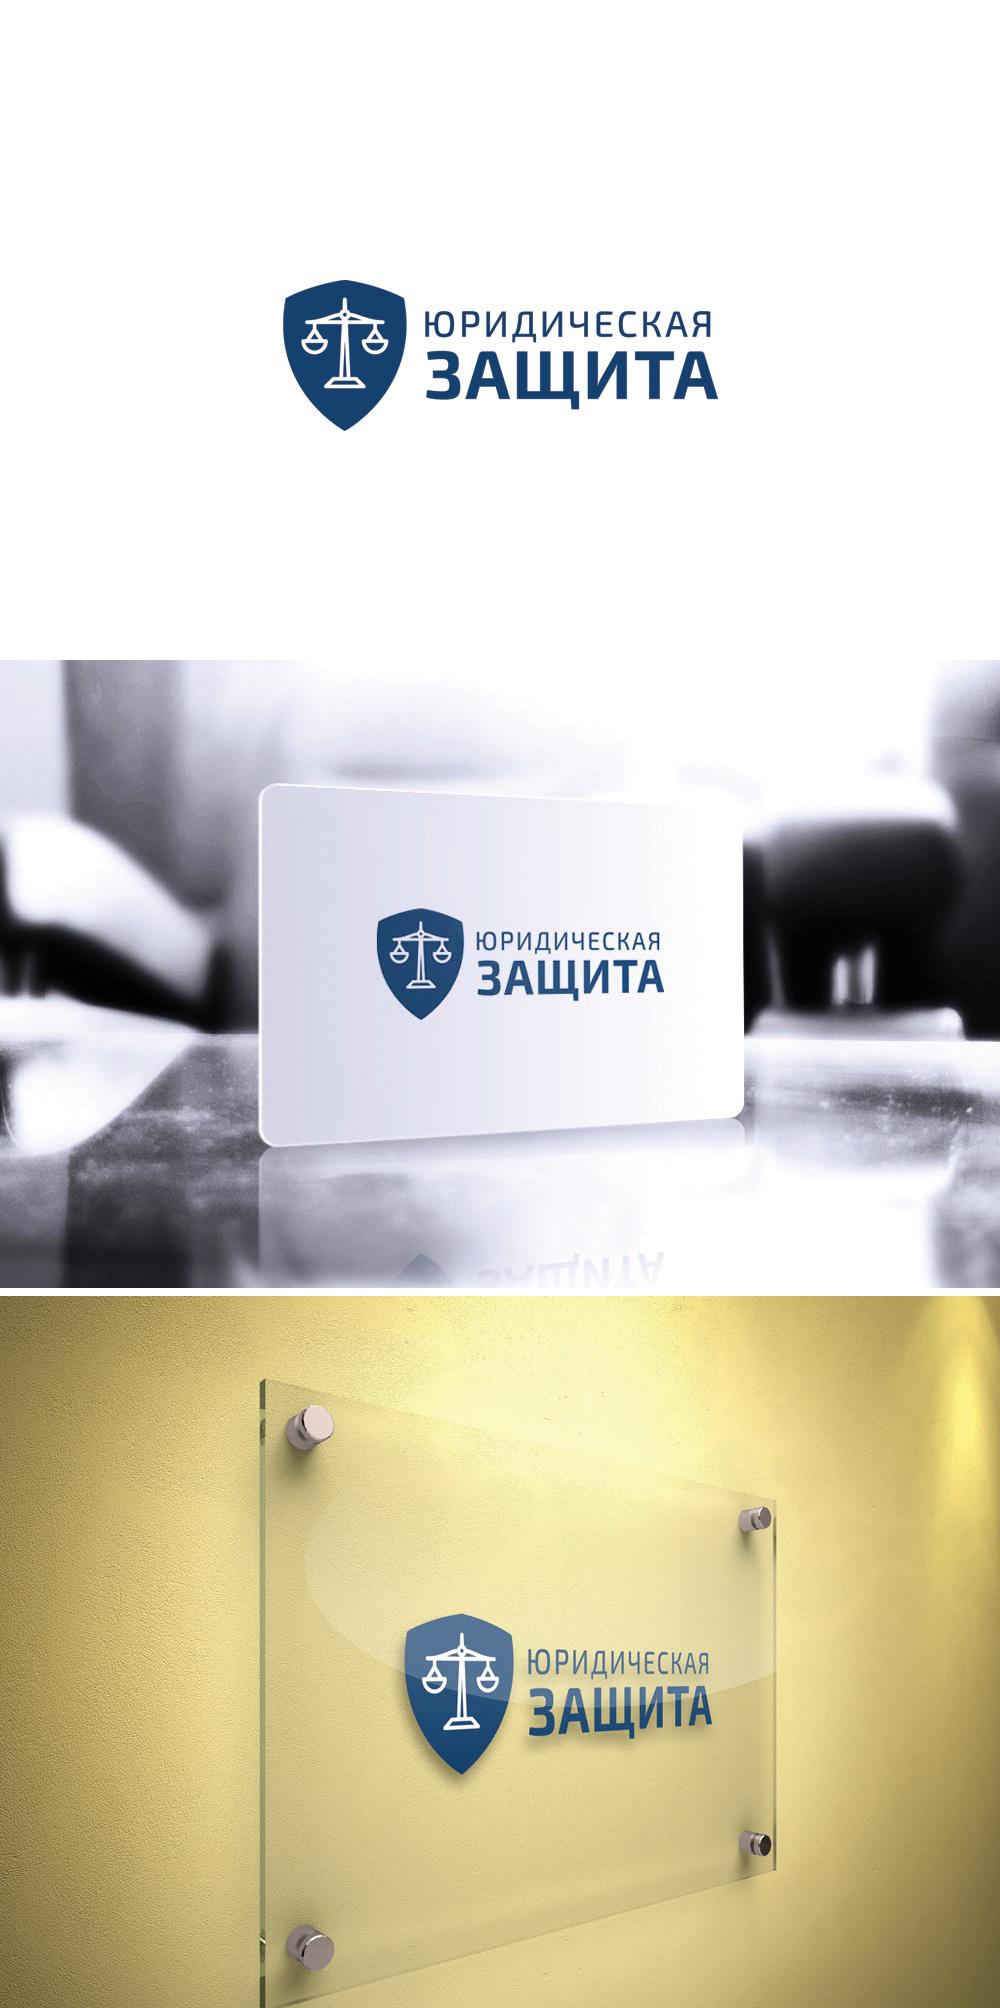 Разработка логотипа для юридической компании фото f_44455ddf3ca2ecac.jpg